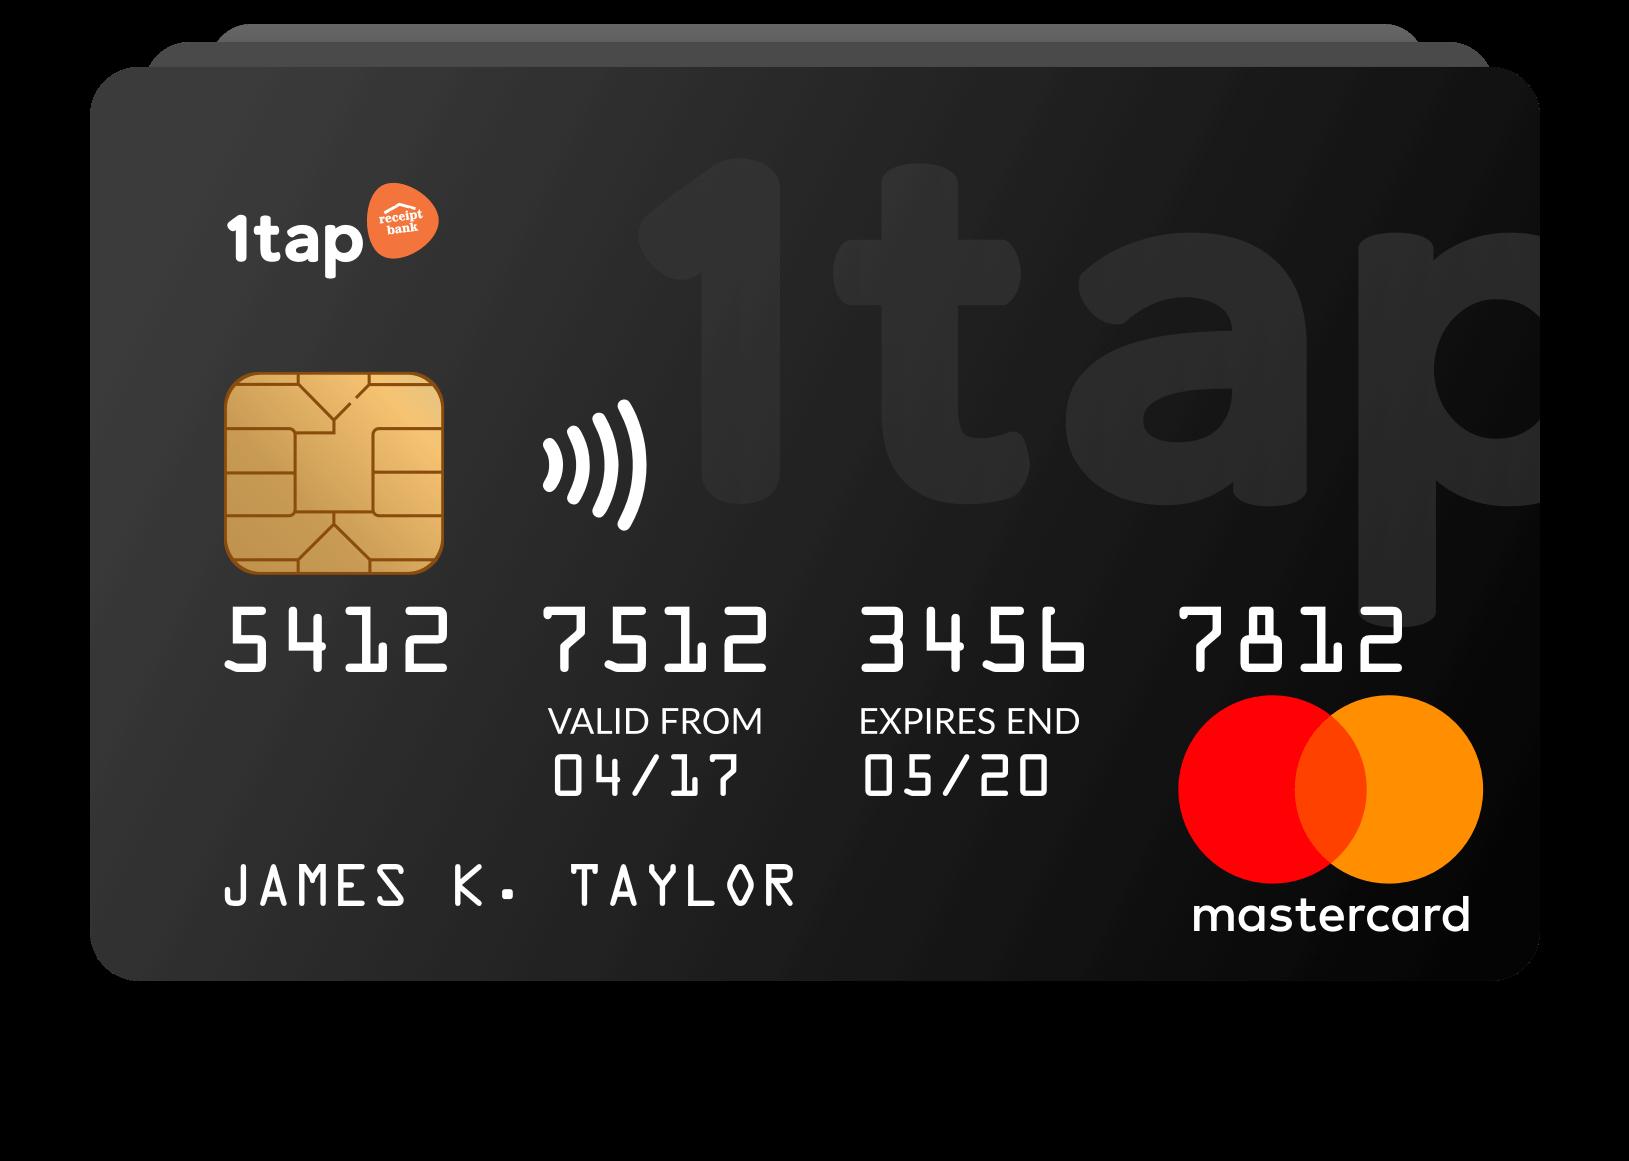 1tap Money Card